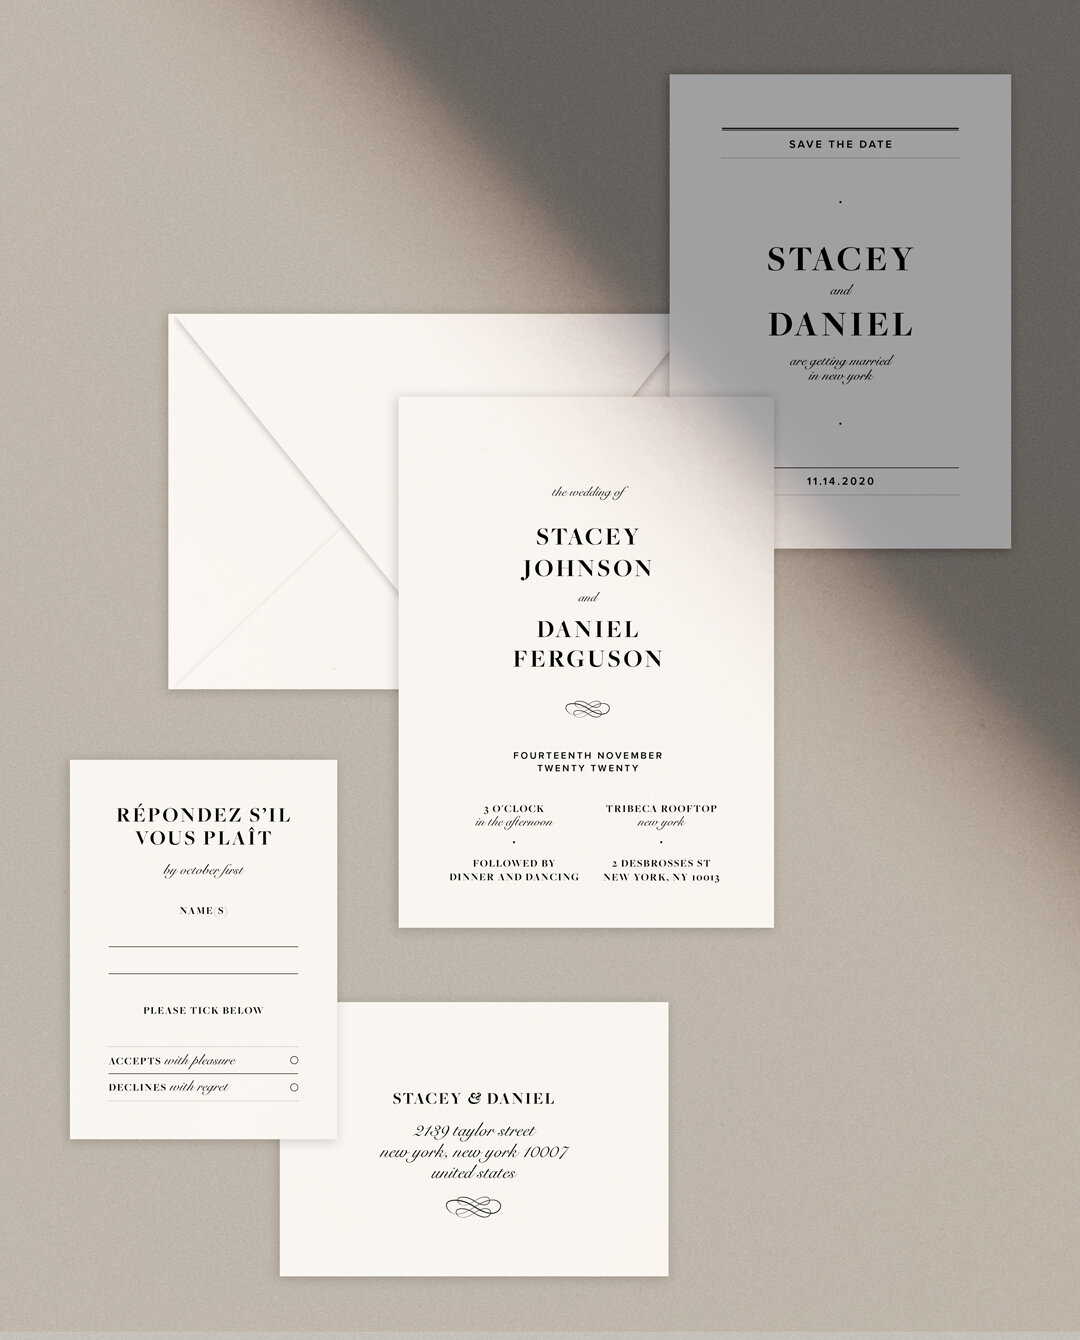 Traditional-Wedding-Invitations.jpg